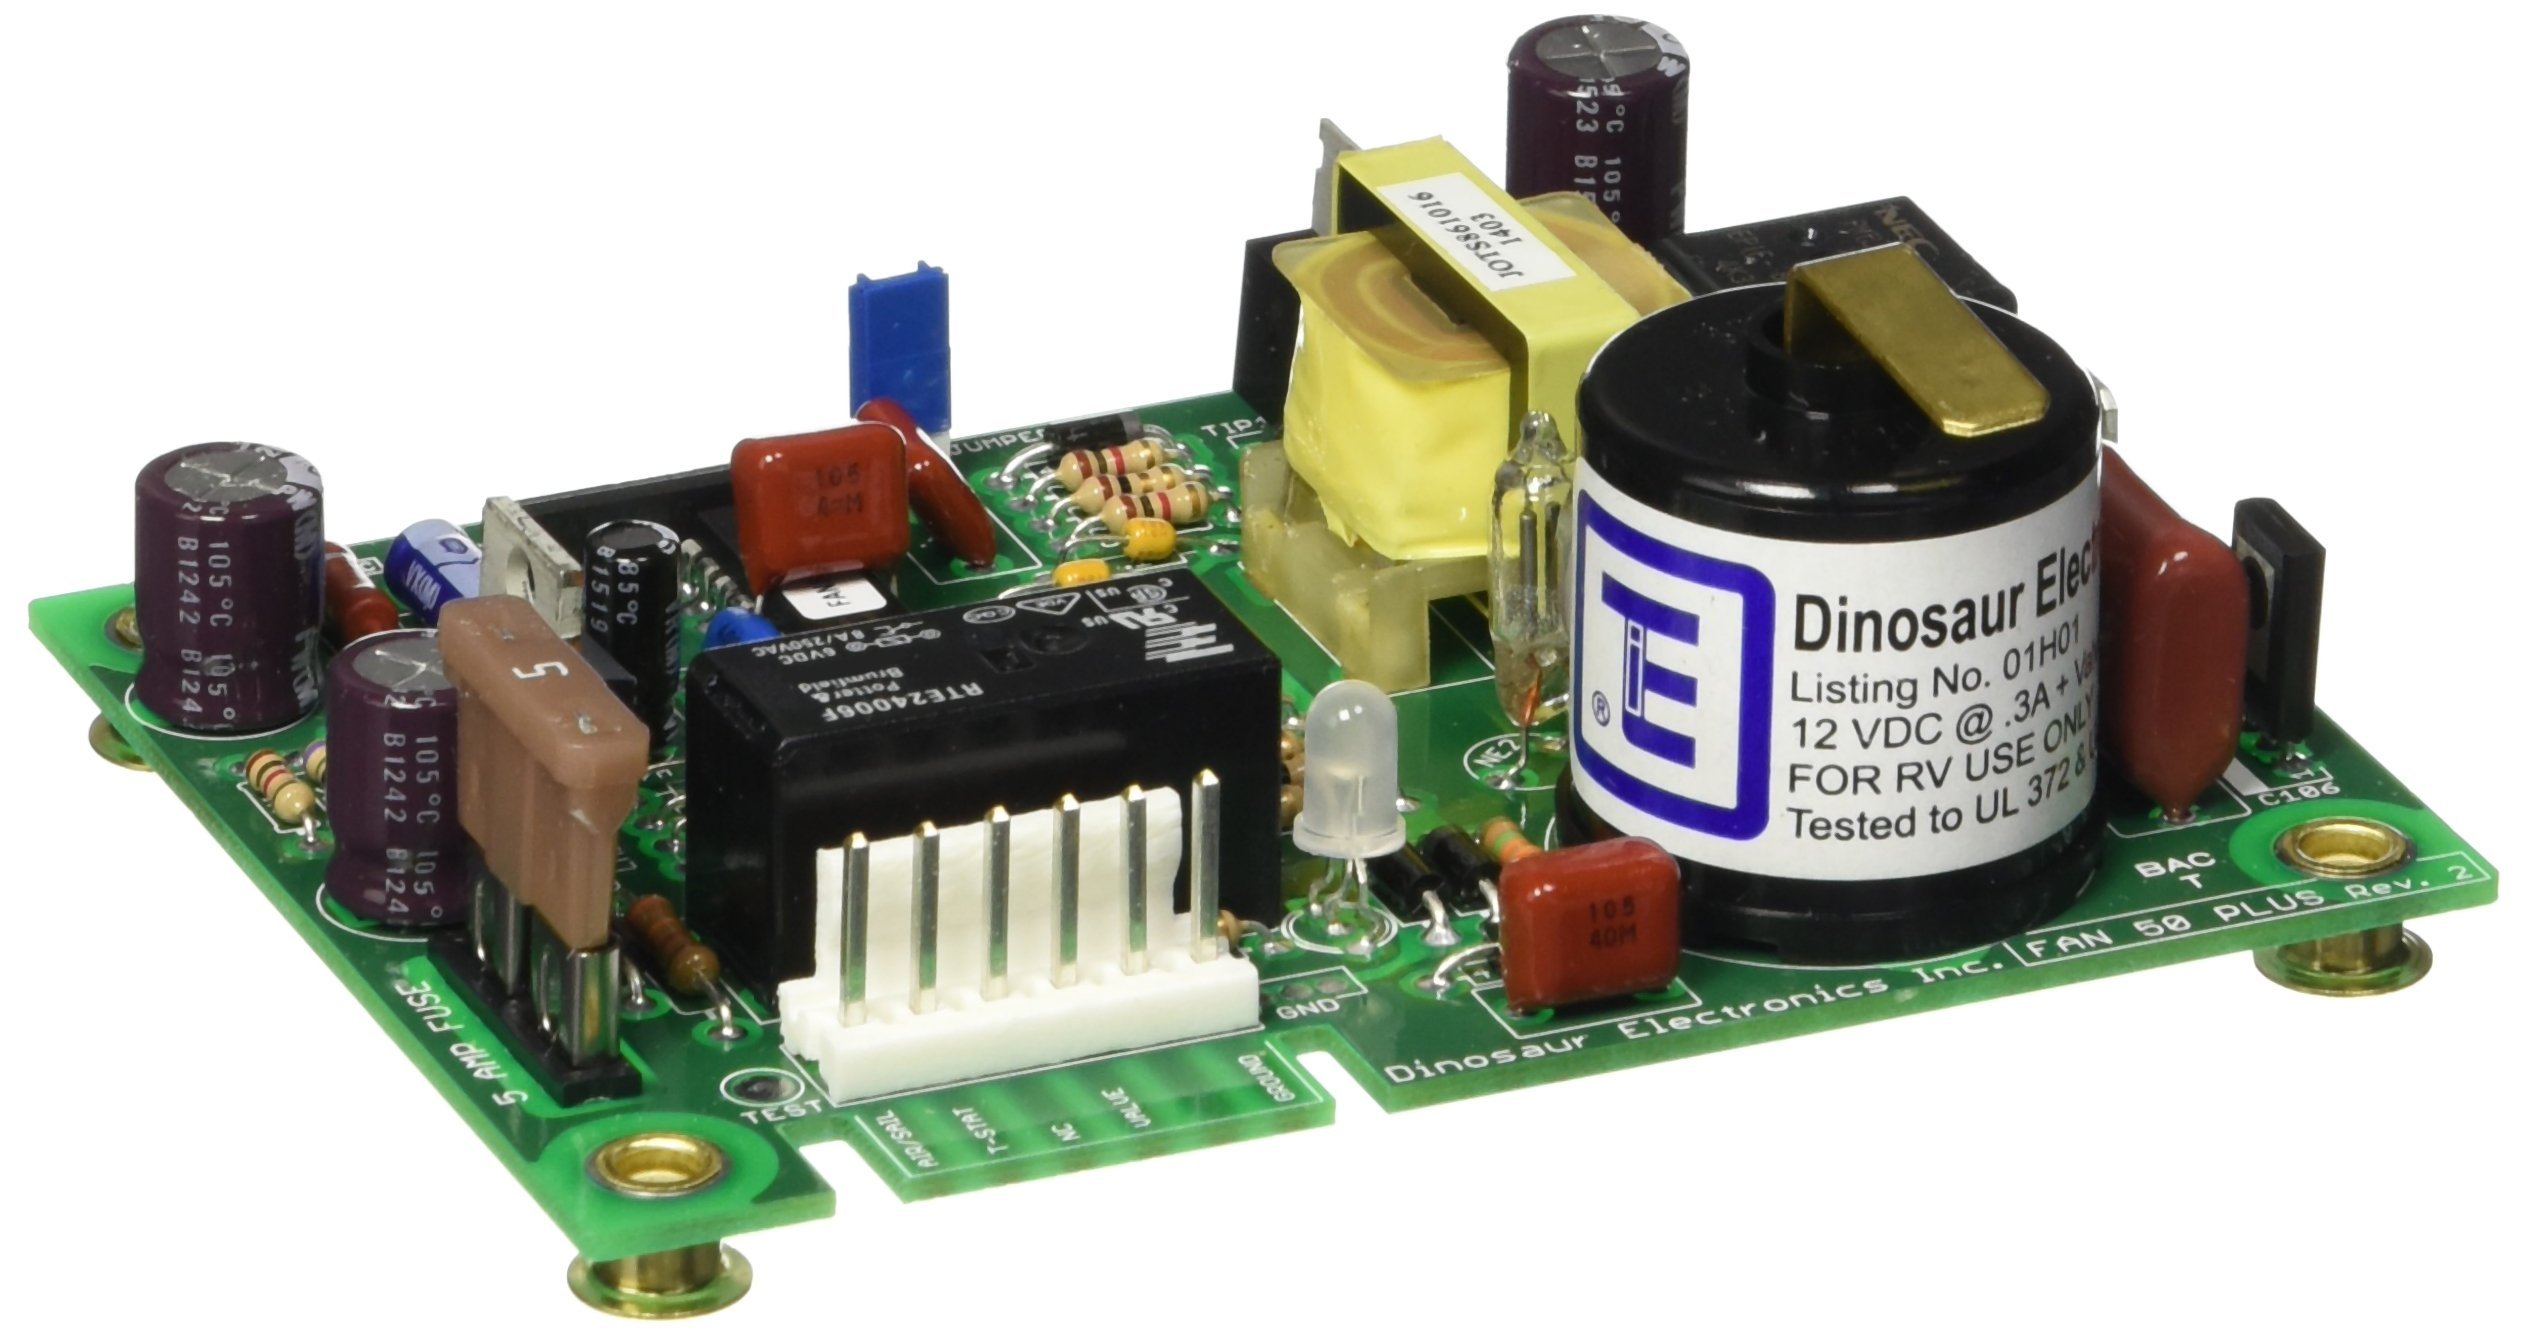 suburban furnace parts amazon com Suburban nt30s Parts dinosaur electronics fan50plus universal igniter board with fan control